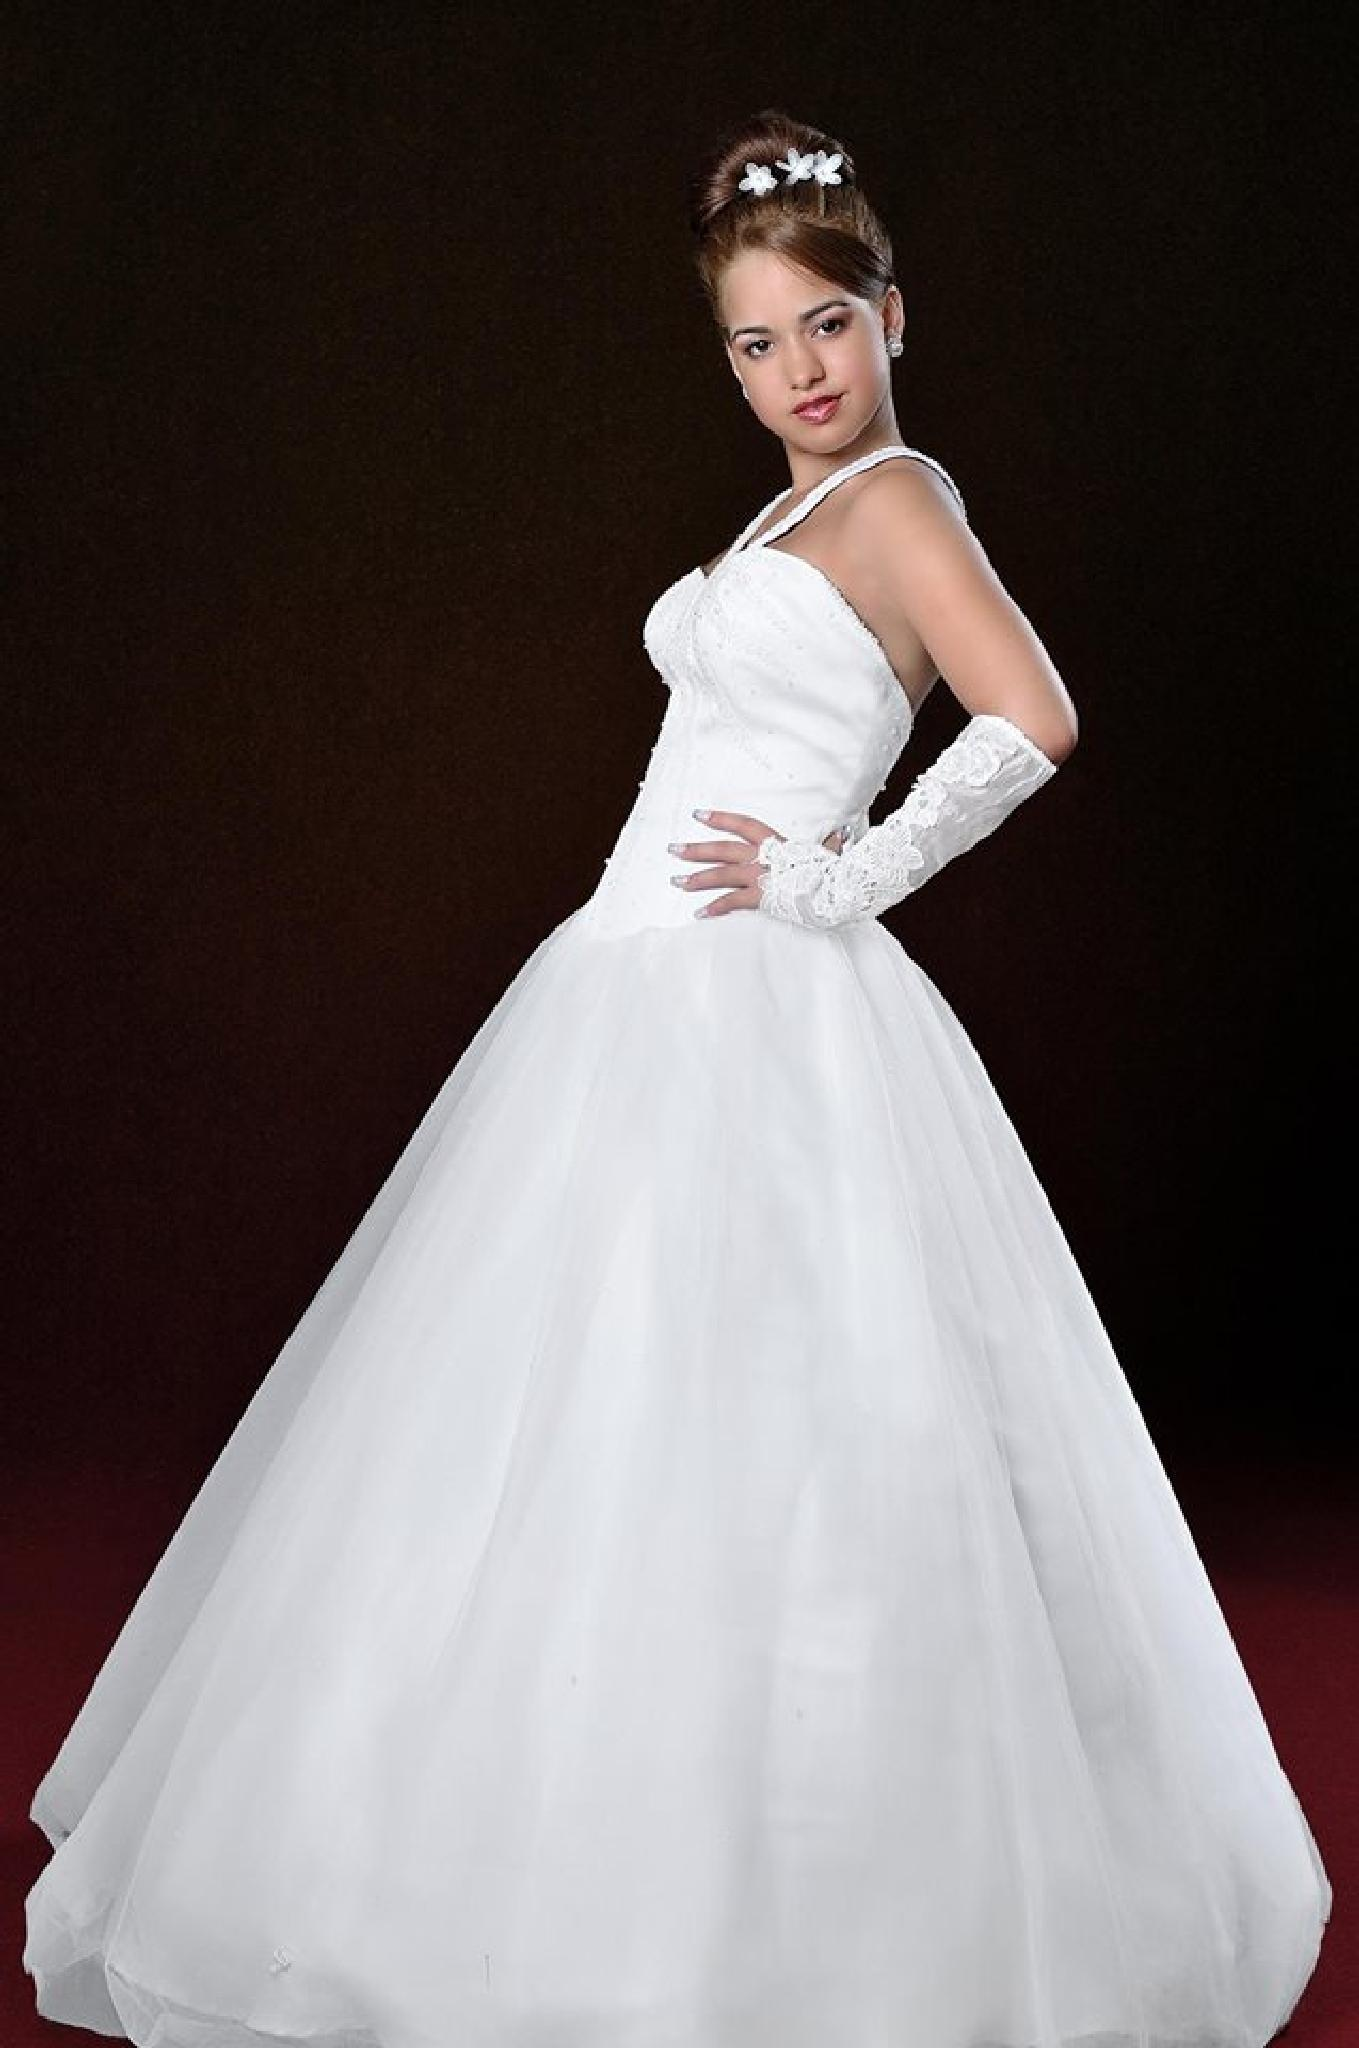 In Prom Dress by Markesky Holland